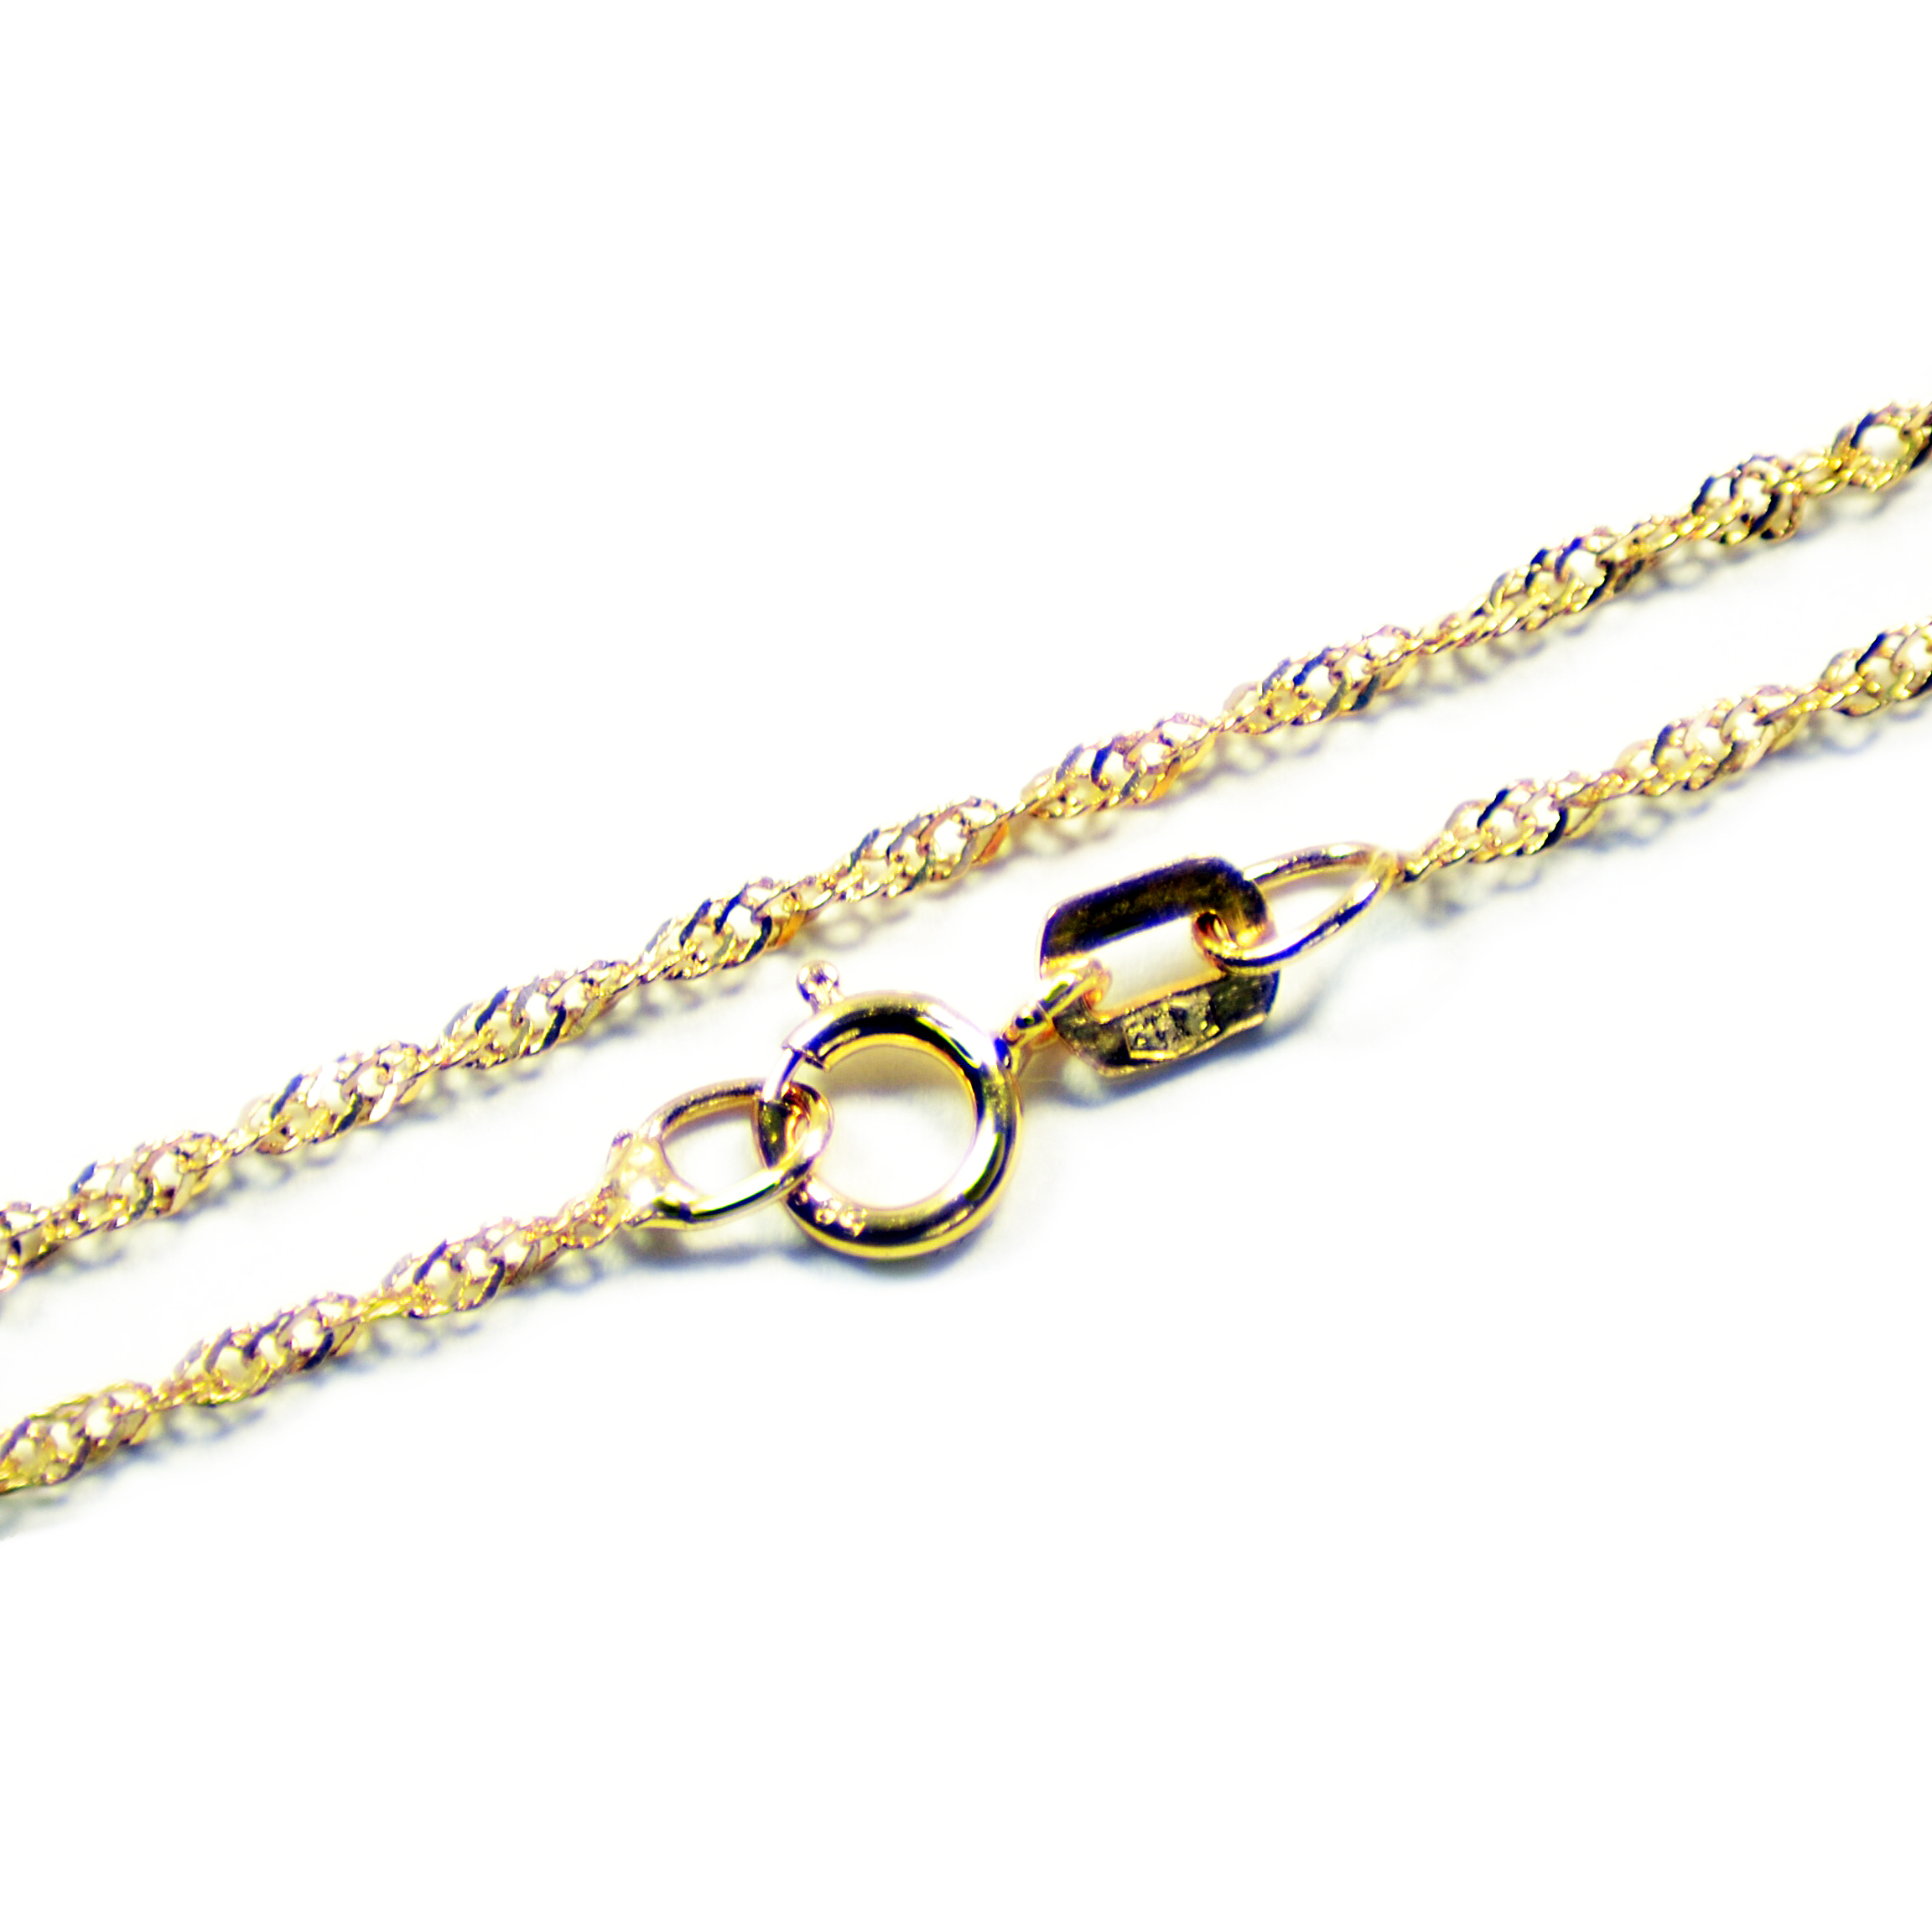 Zlatá Reťaz Zlatý Náhrdelník 585 DŁ45cm (w448)